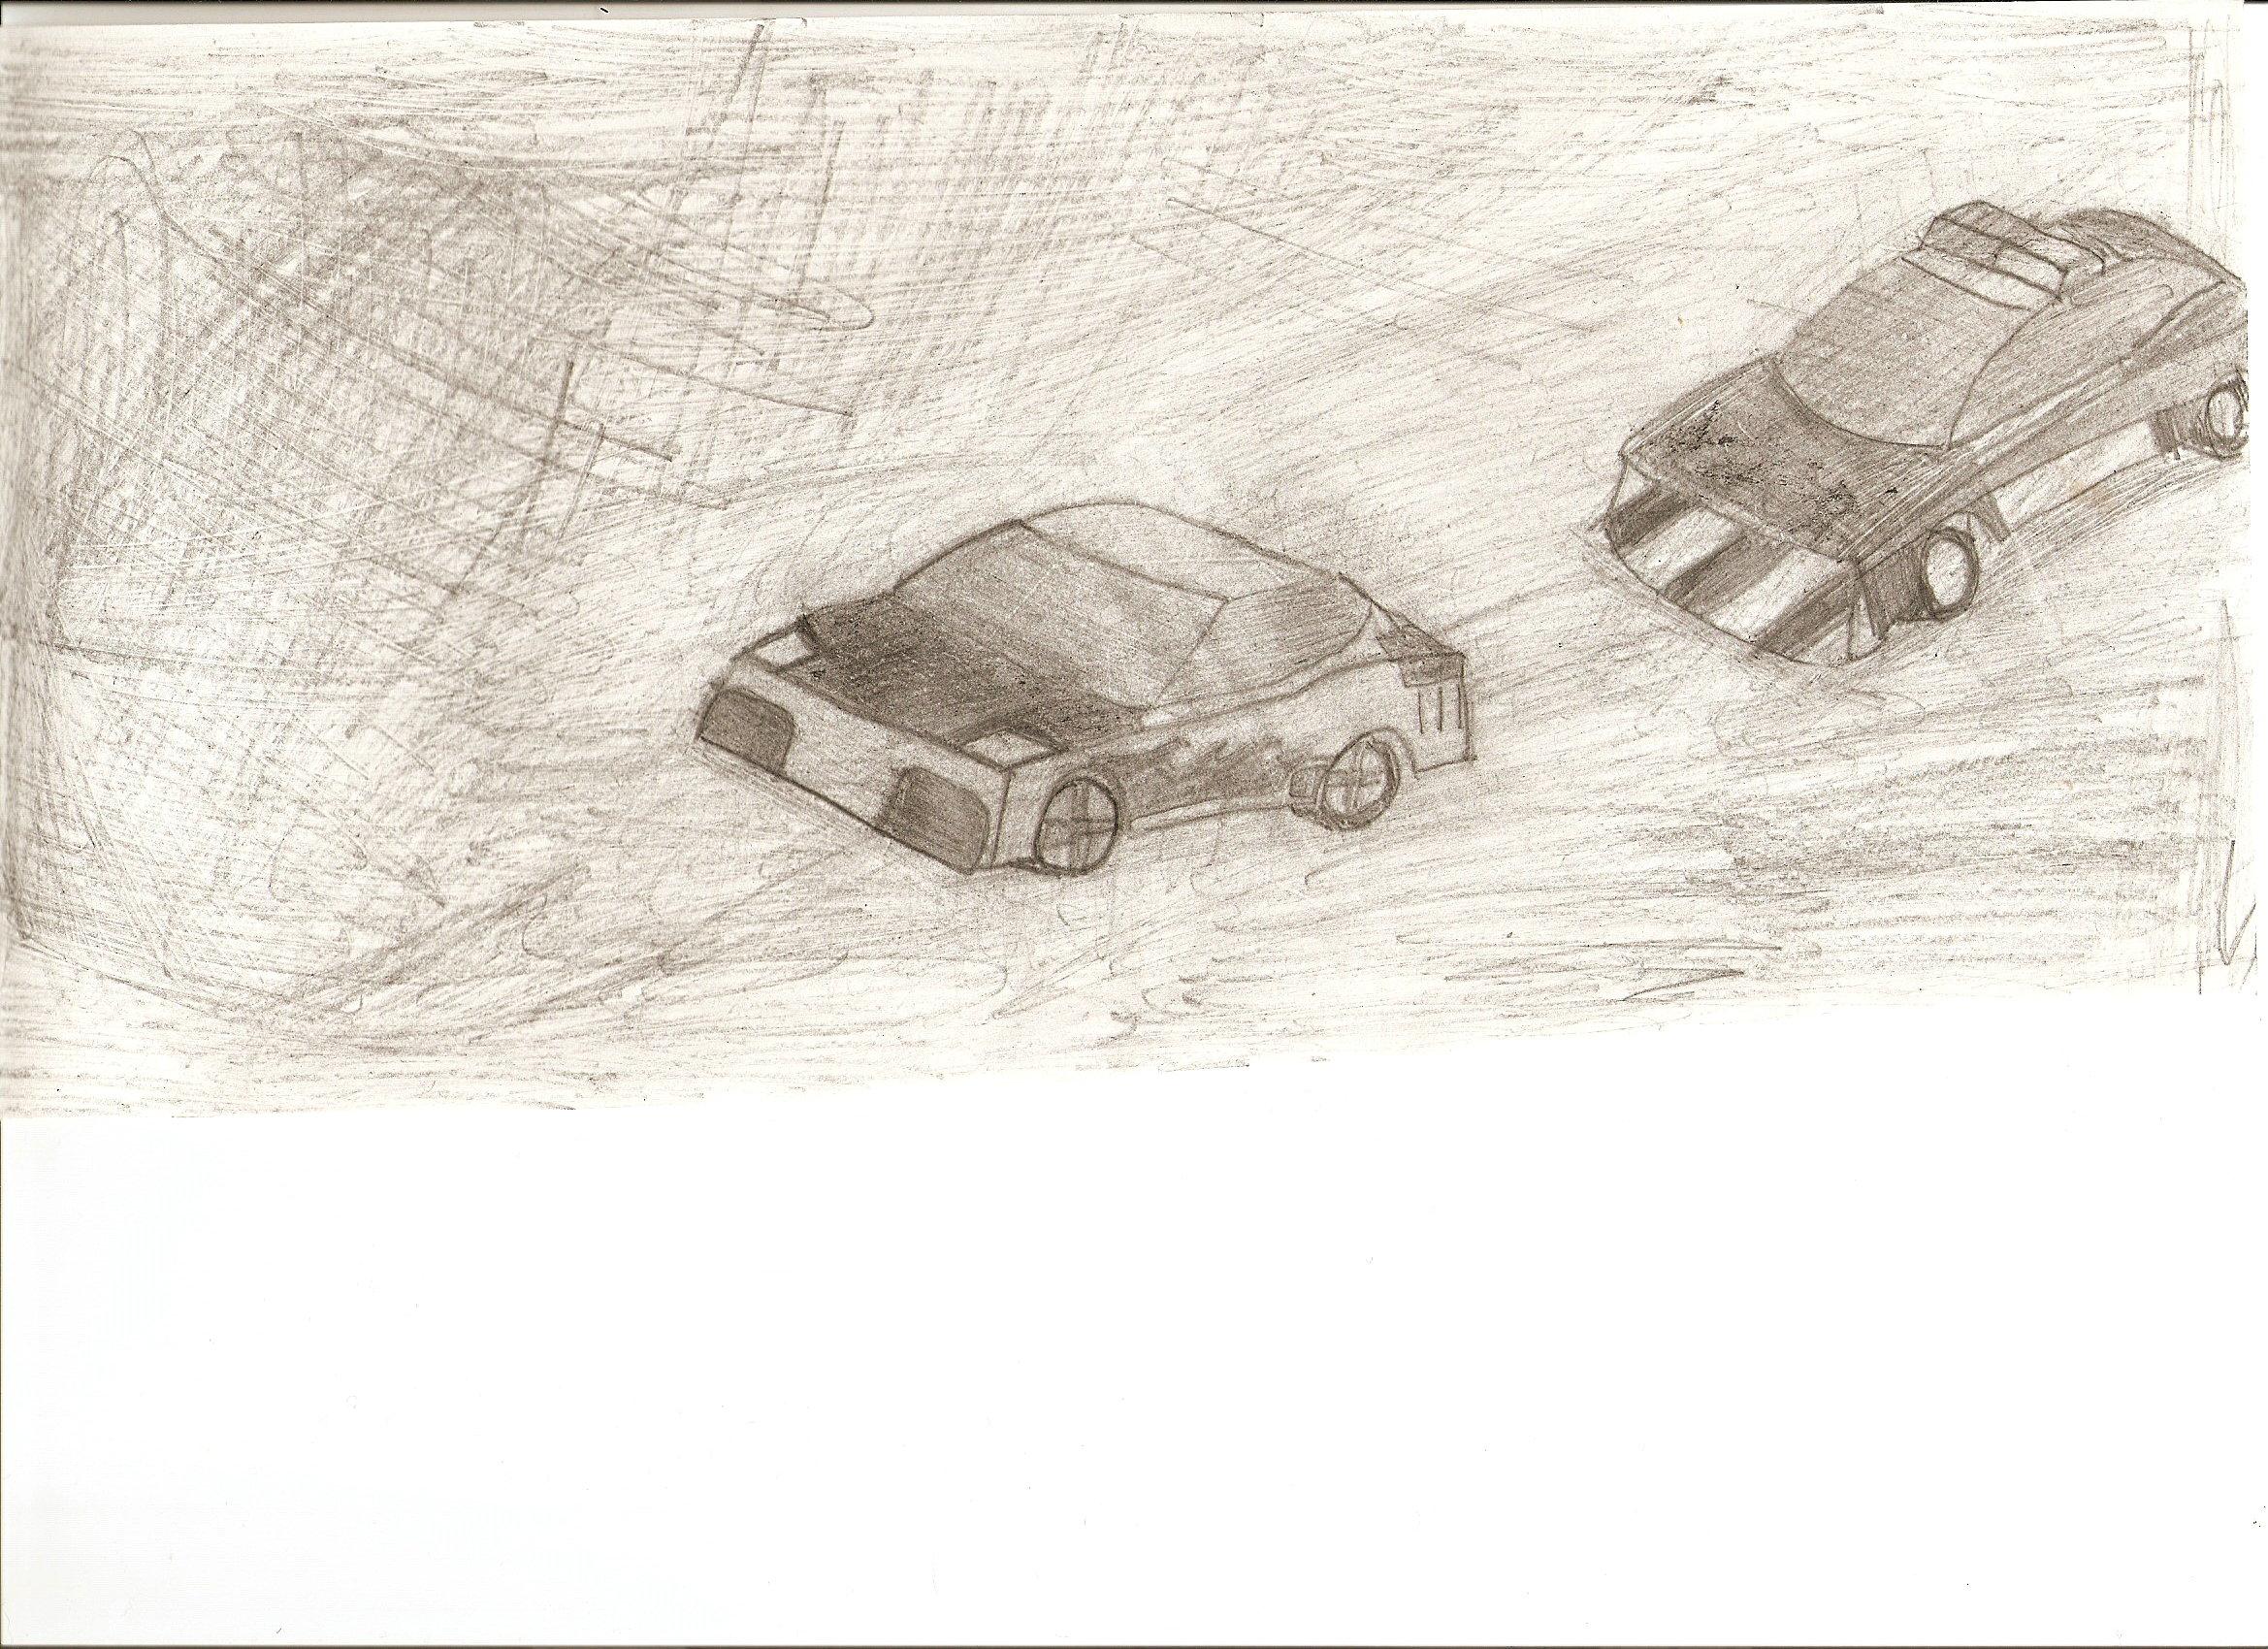 Lamborghini and cop car